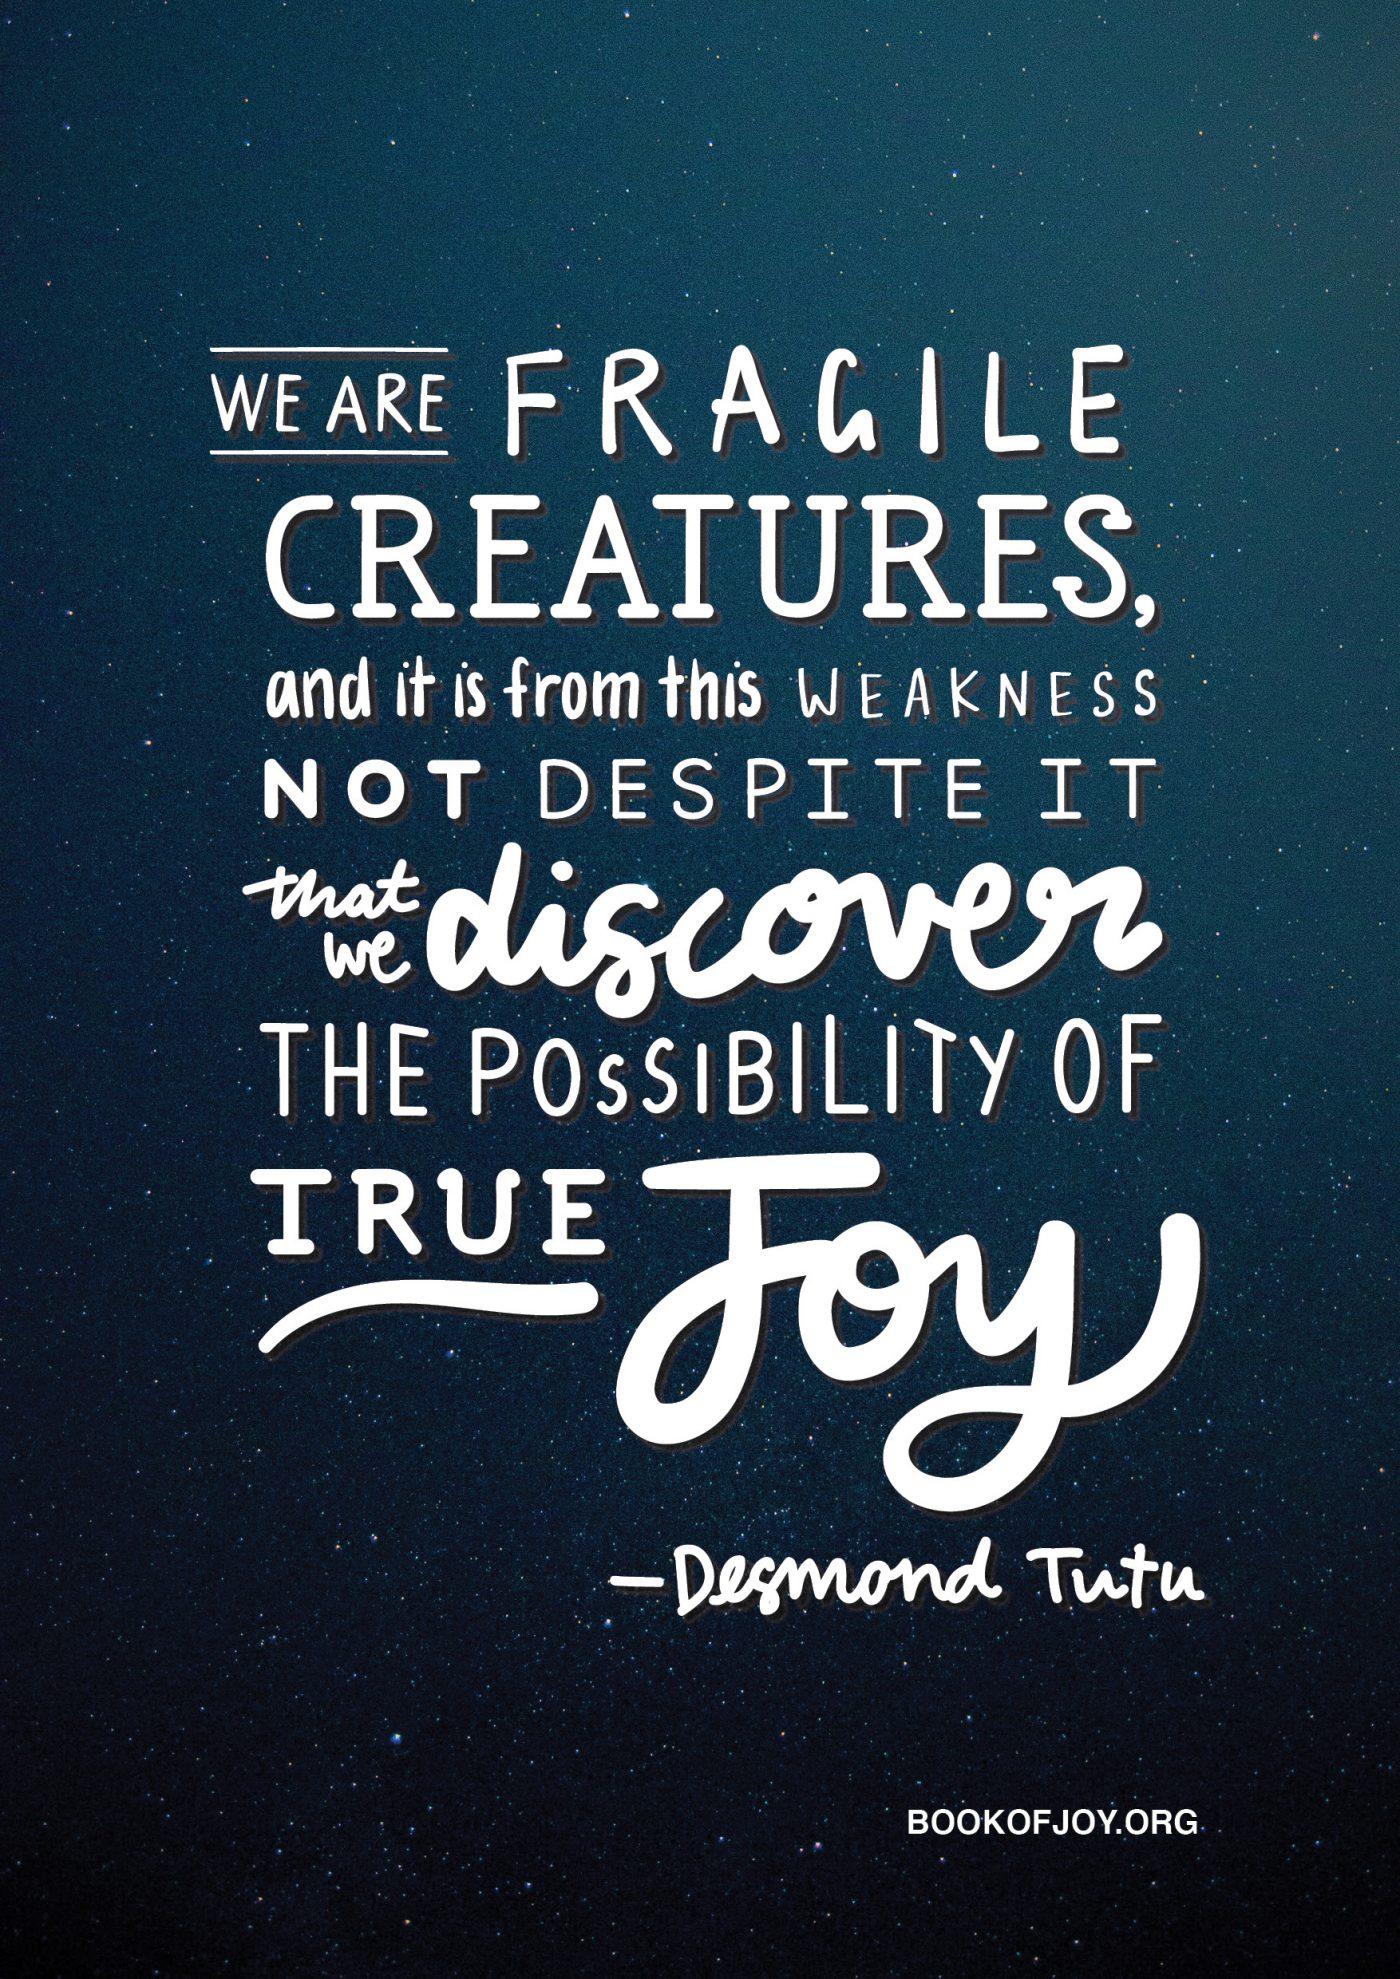 The Book of Joy Poster Campaign Lettering Desmond Tutu Dalai Lama